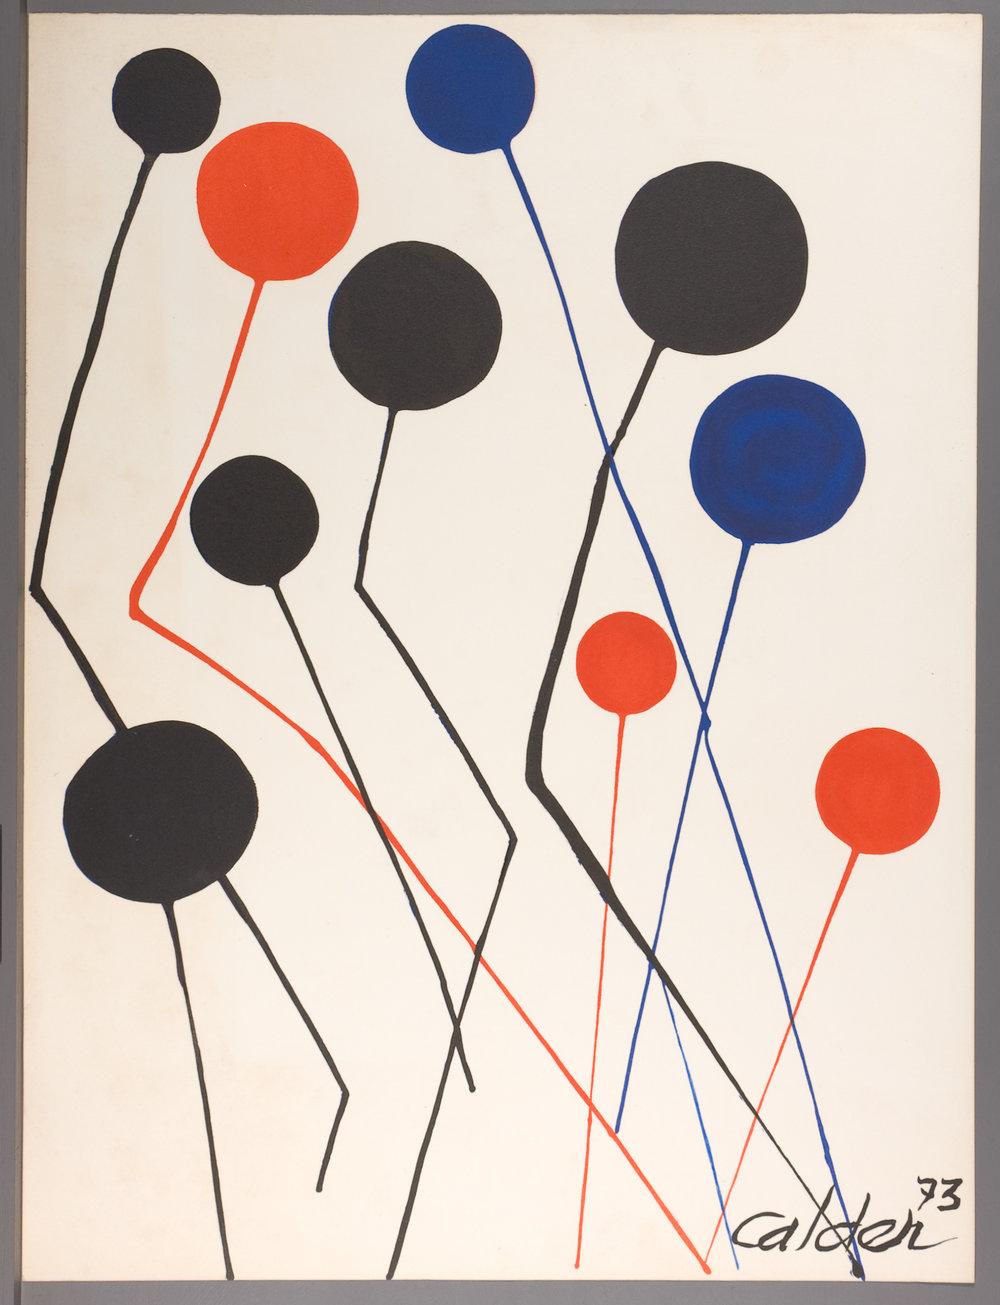 Calder-01-before